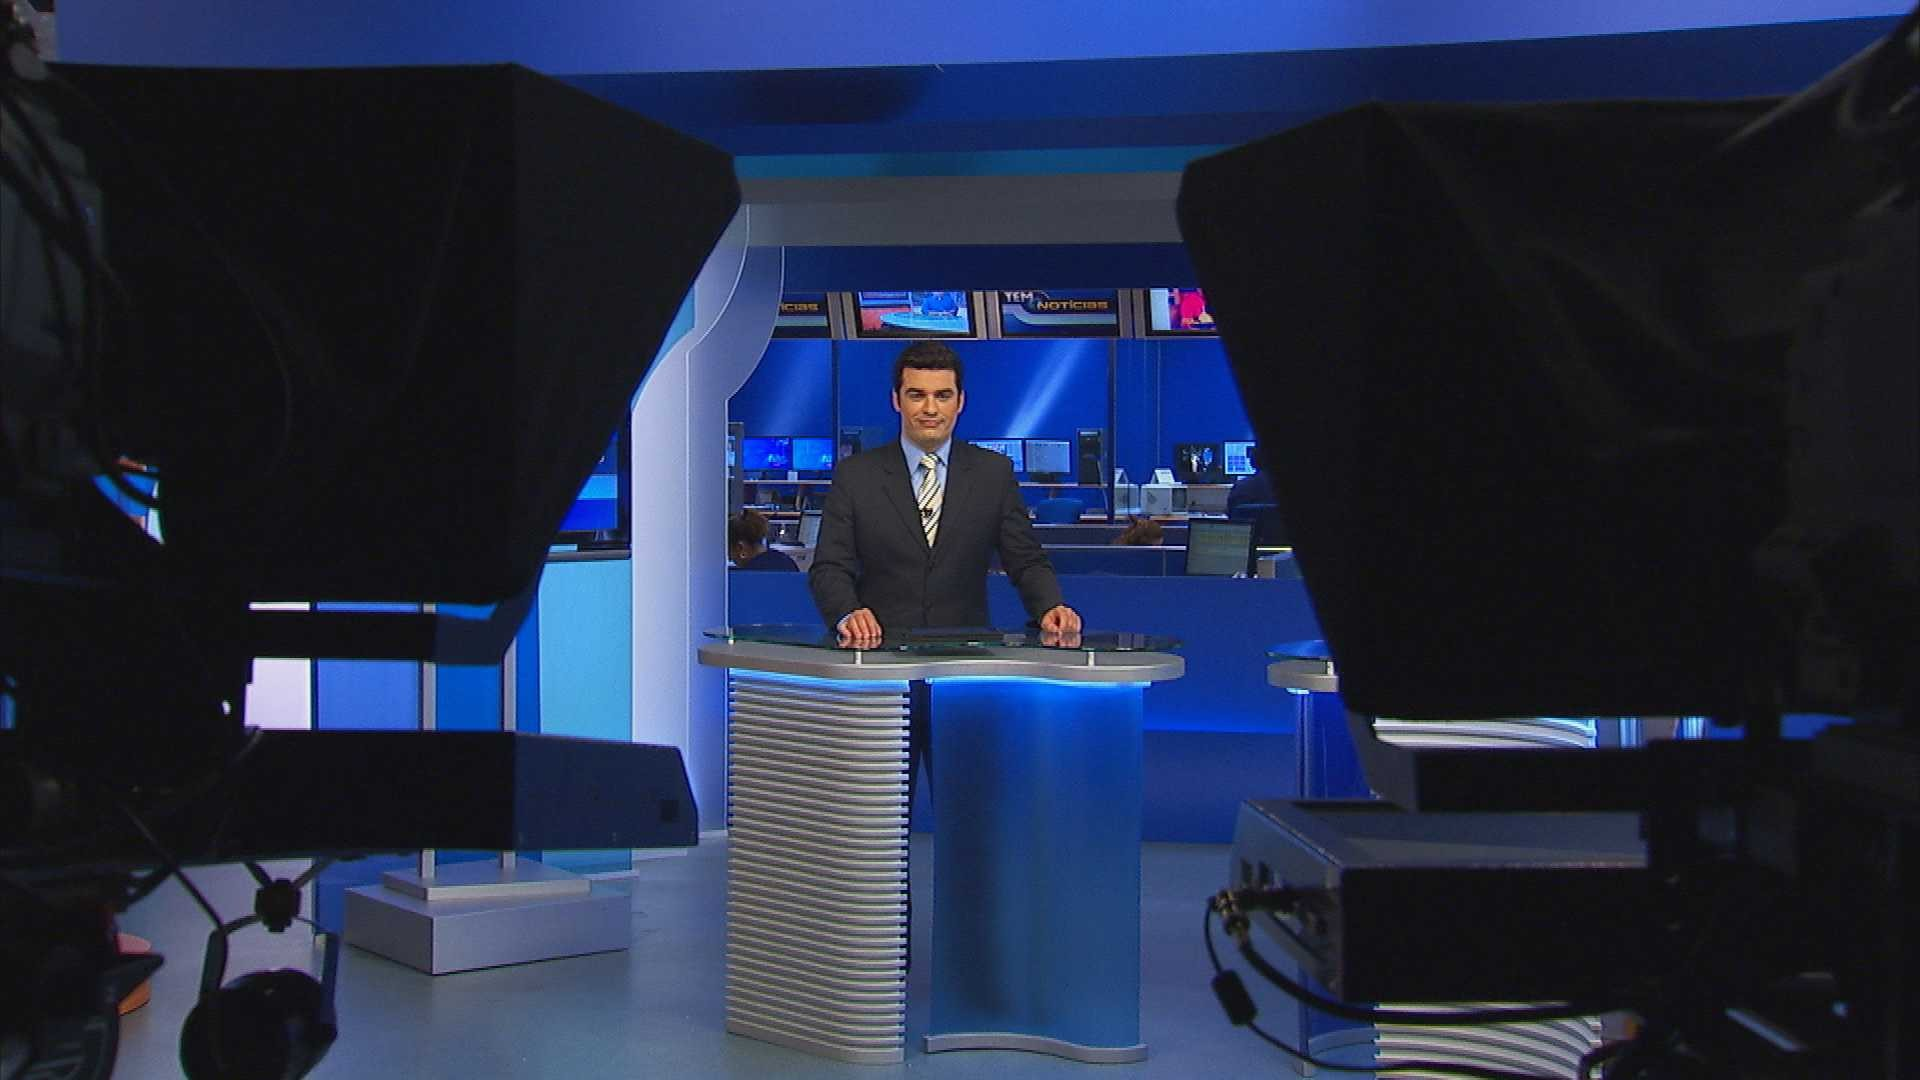 TV Tem Studios (Globo Sorocaba, a municipality in the state of Sao Paulo)